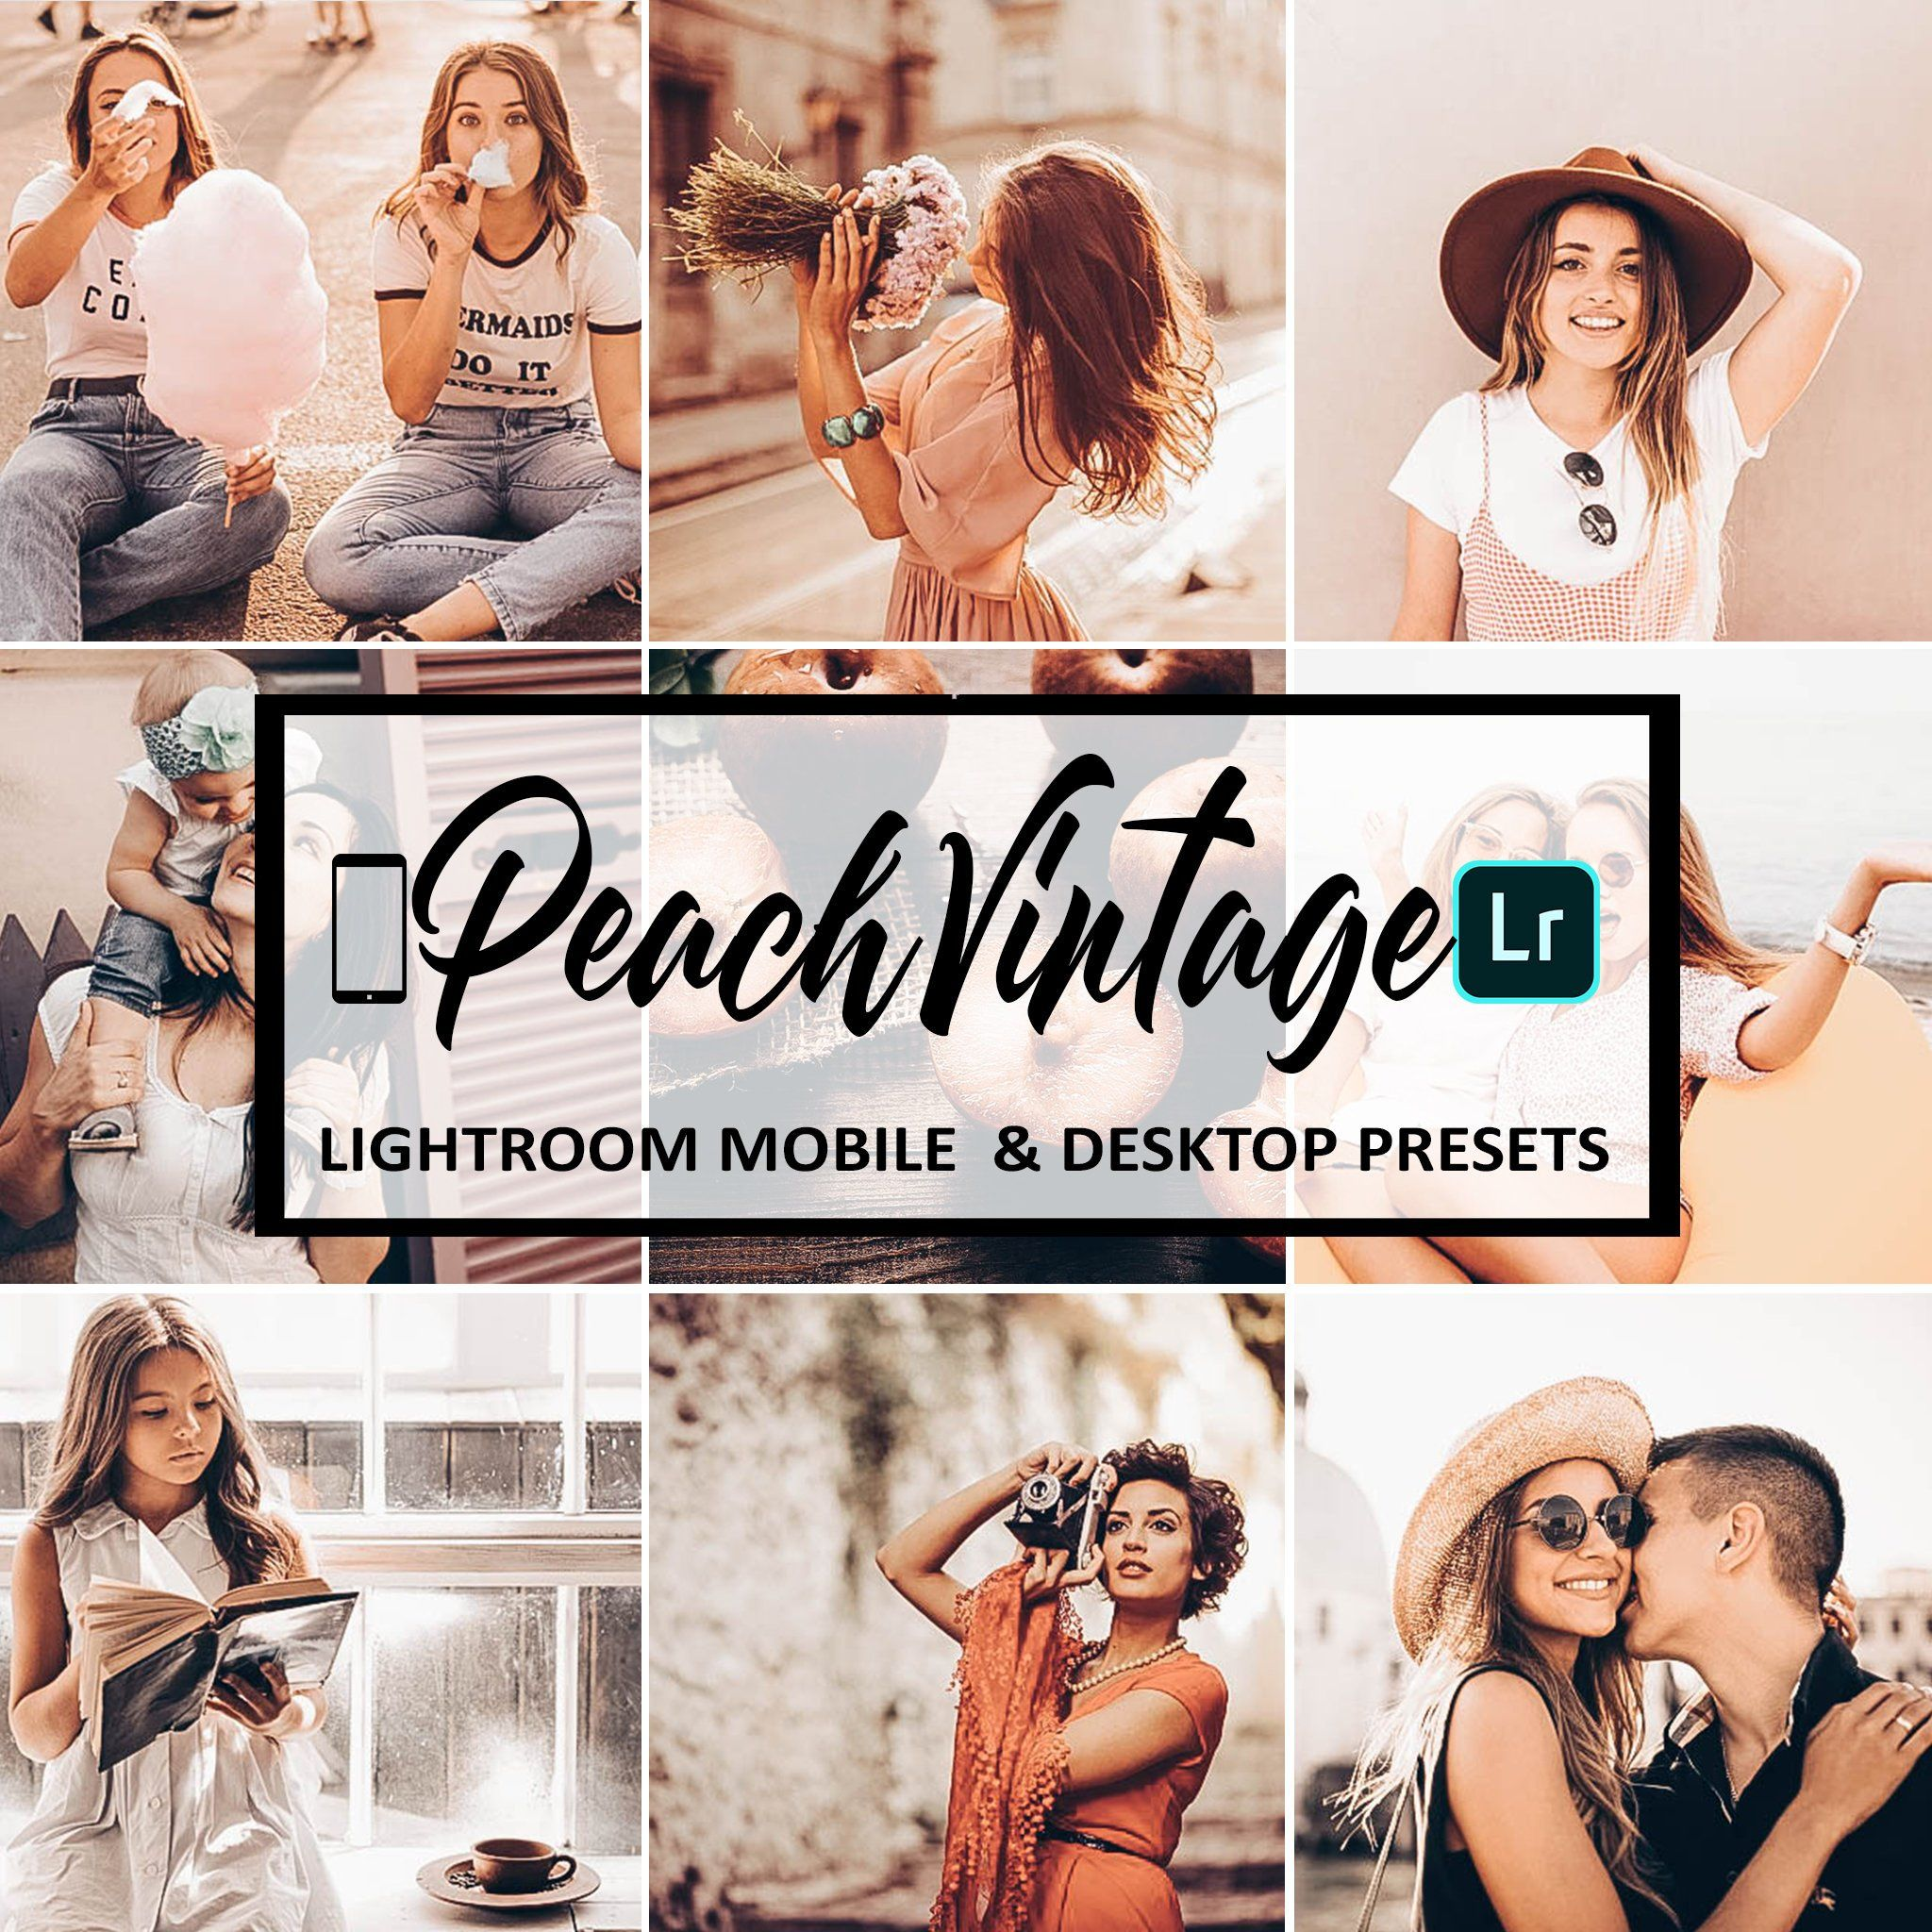 Peach Vintage Preset Presets Lightroom Mobile Lightroom Etsy In 2020 Lightroom Lightroom Presets Instagram Lifestyle